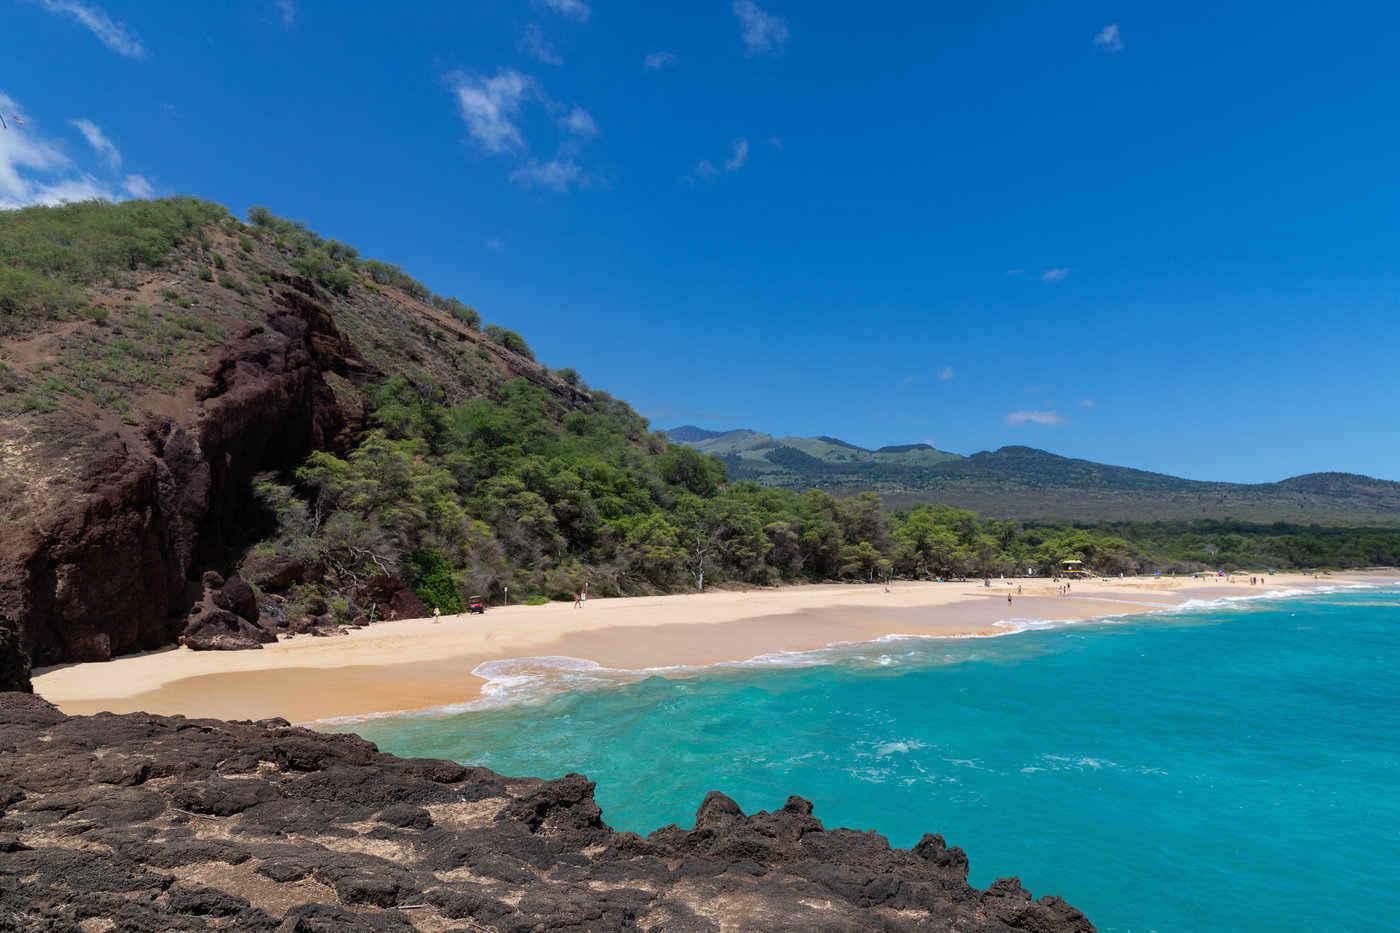 makena beach - most stunning beaches in hawaii